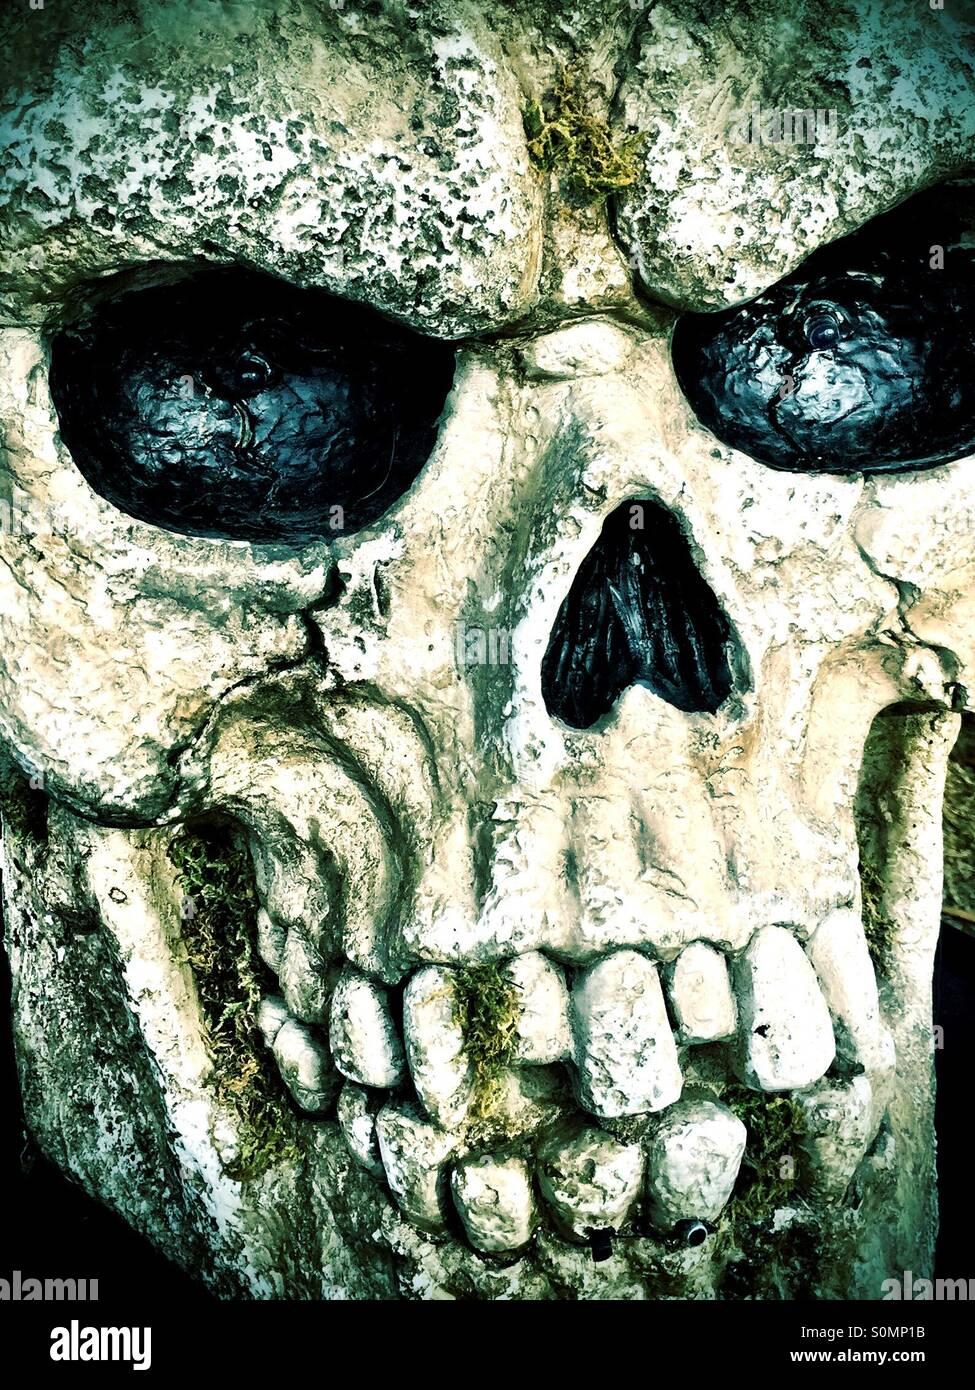 Ghoulish skull grimacing - Stock Image